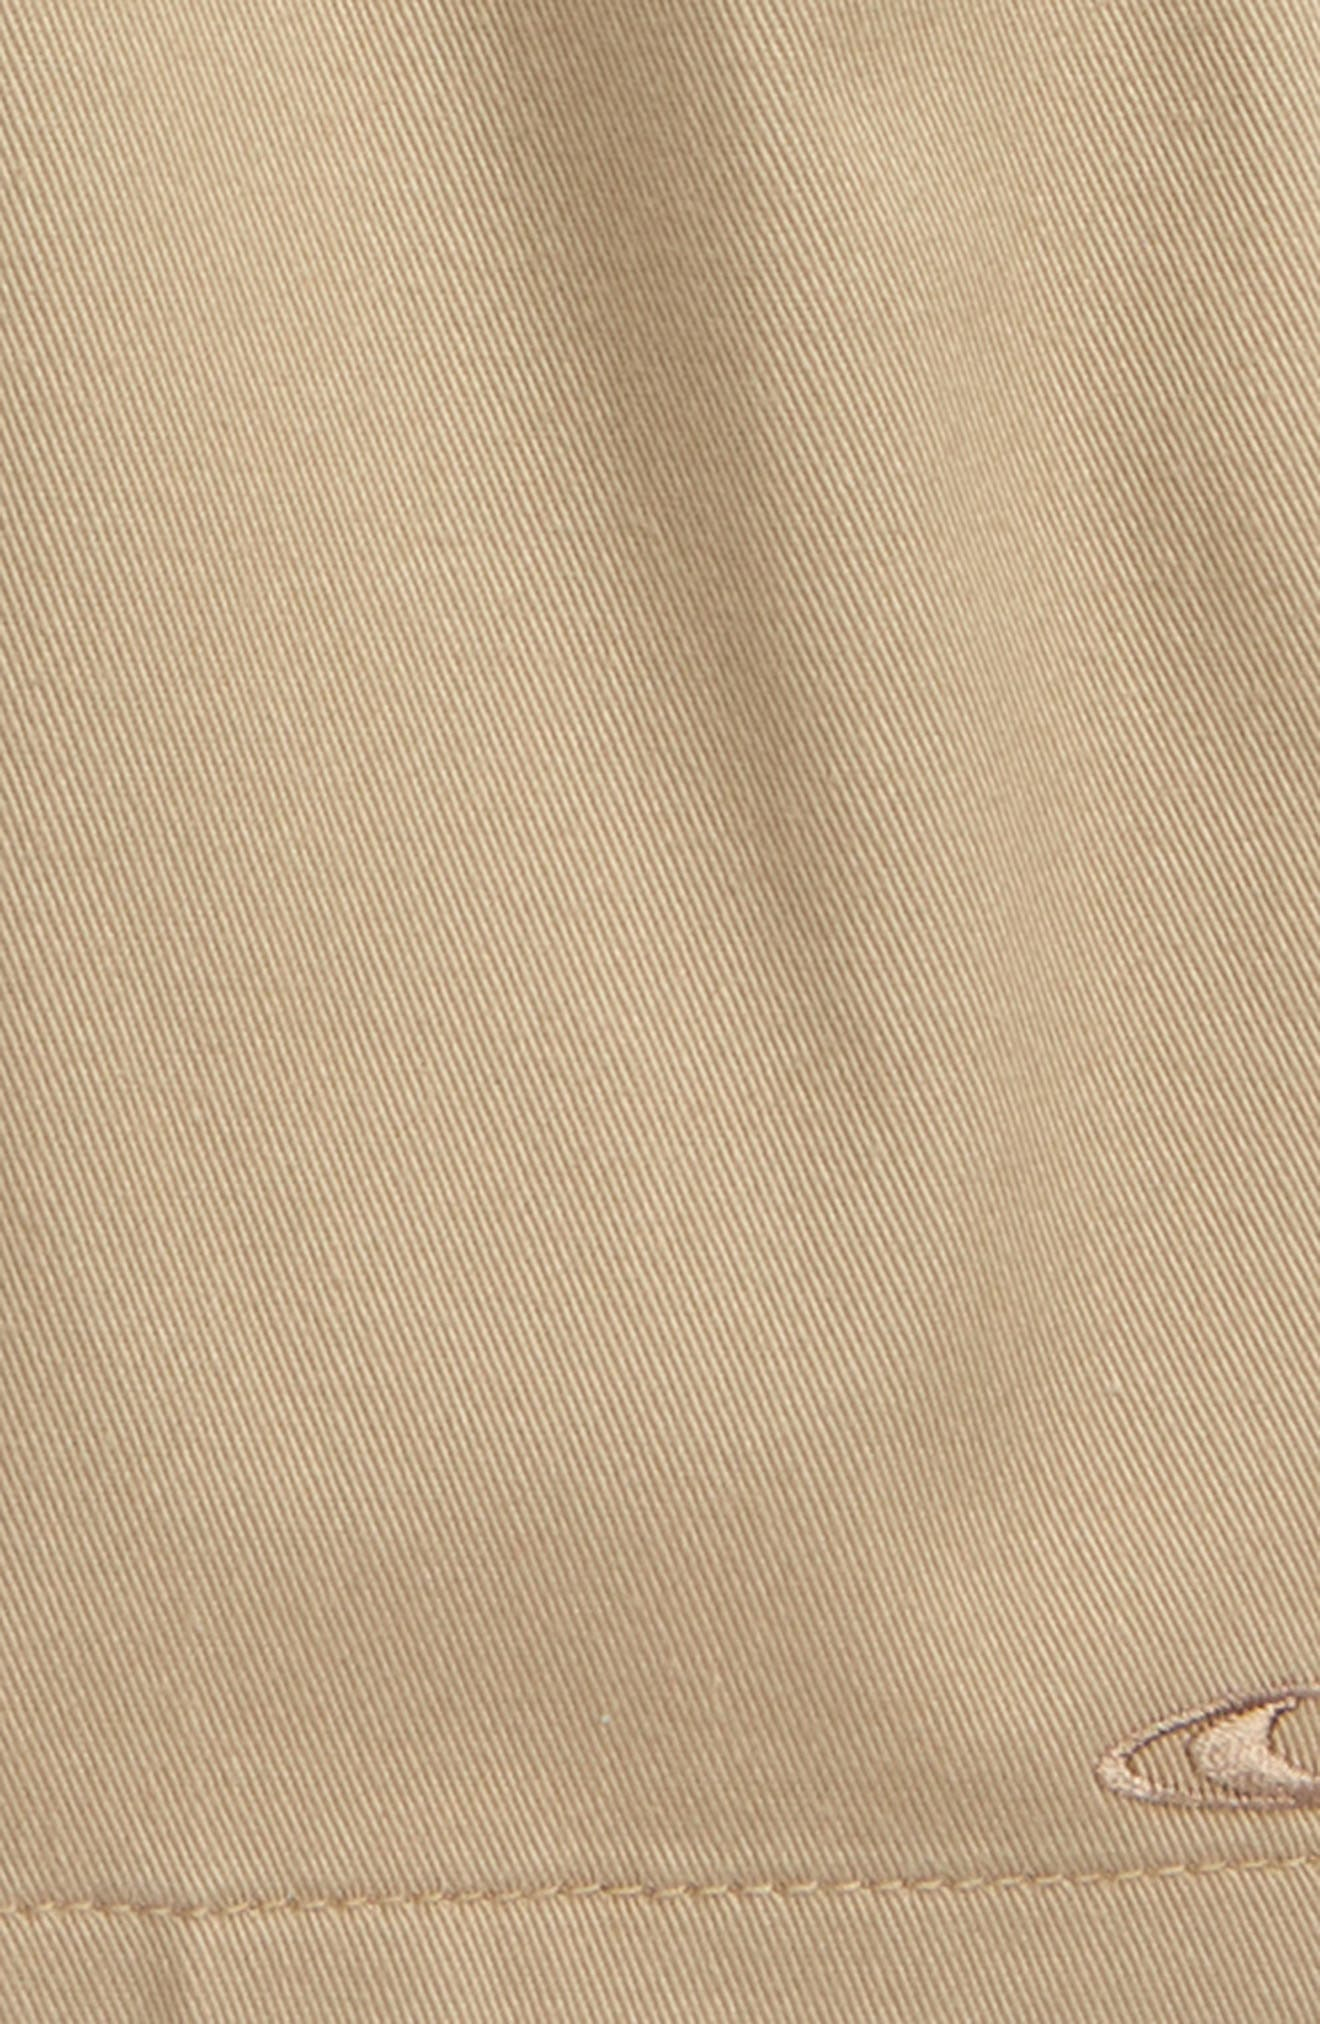 Contact Stretch Shorts,                             Alternate thumbnail 2, color,                             Light Khaki